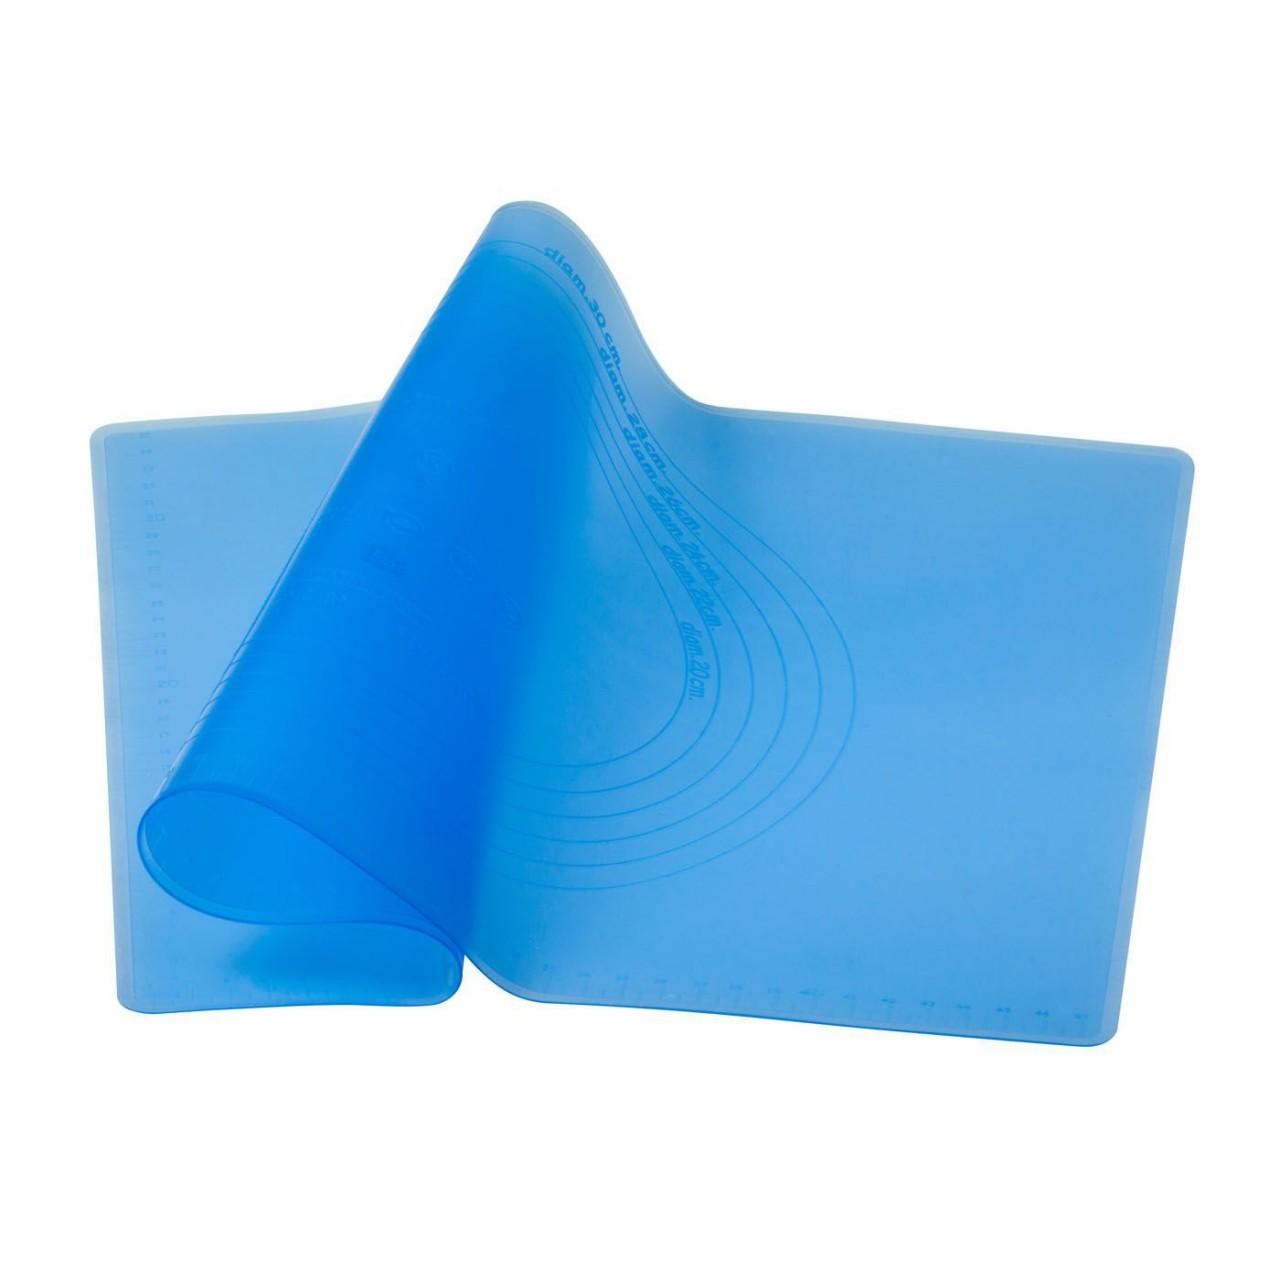 Silikon Backmatte Ausrollmatte groß